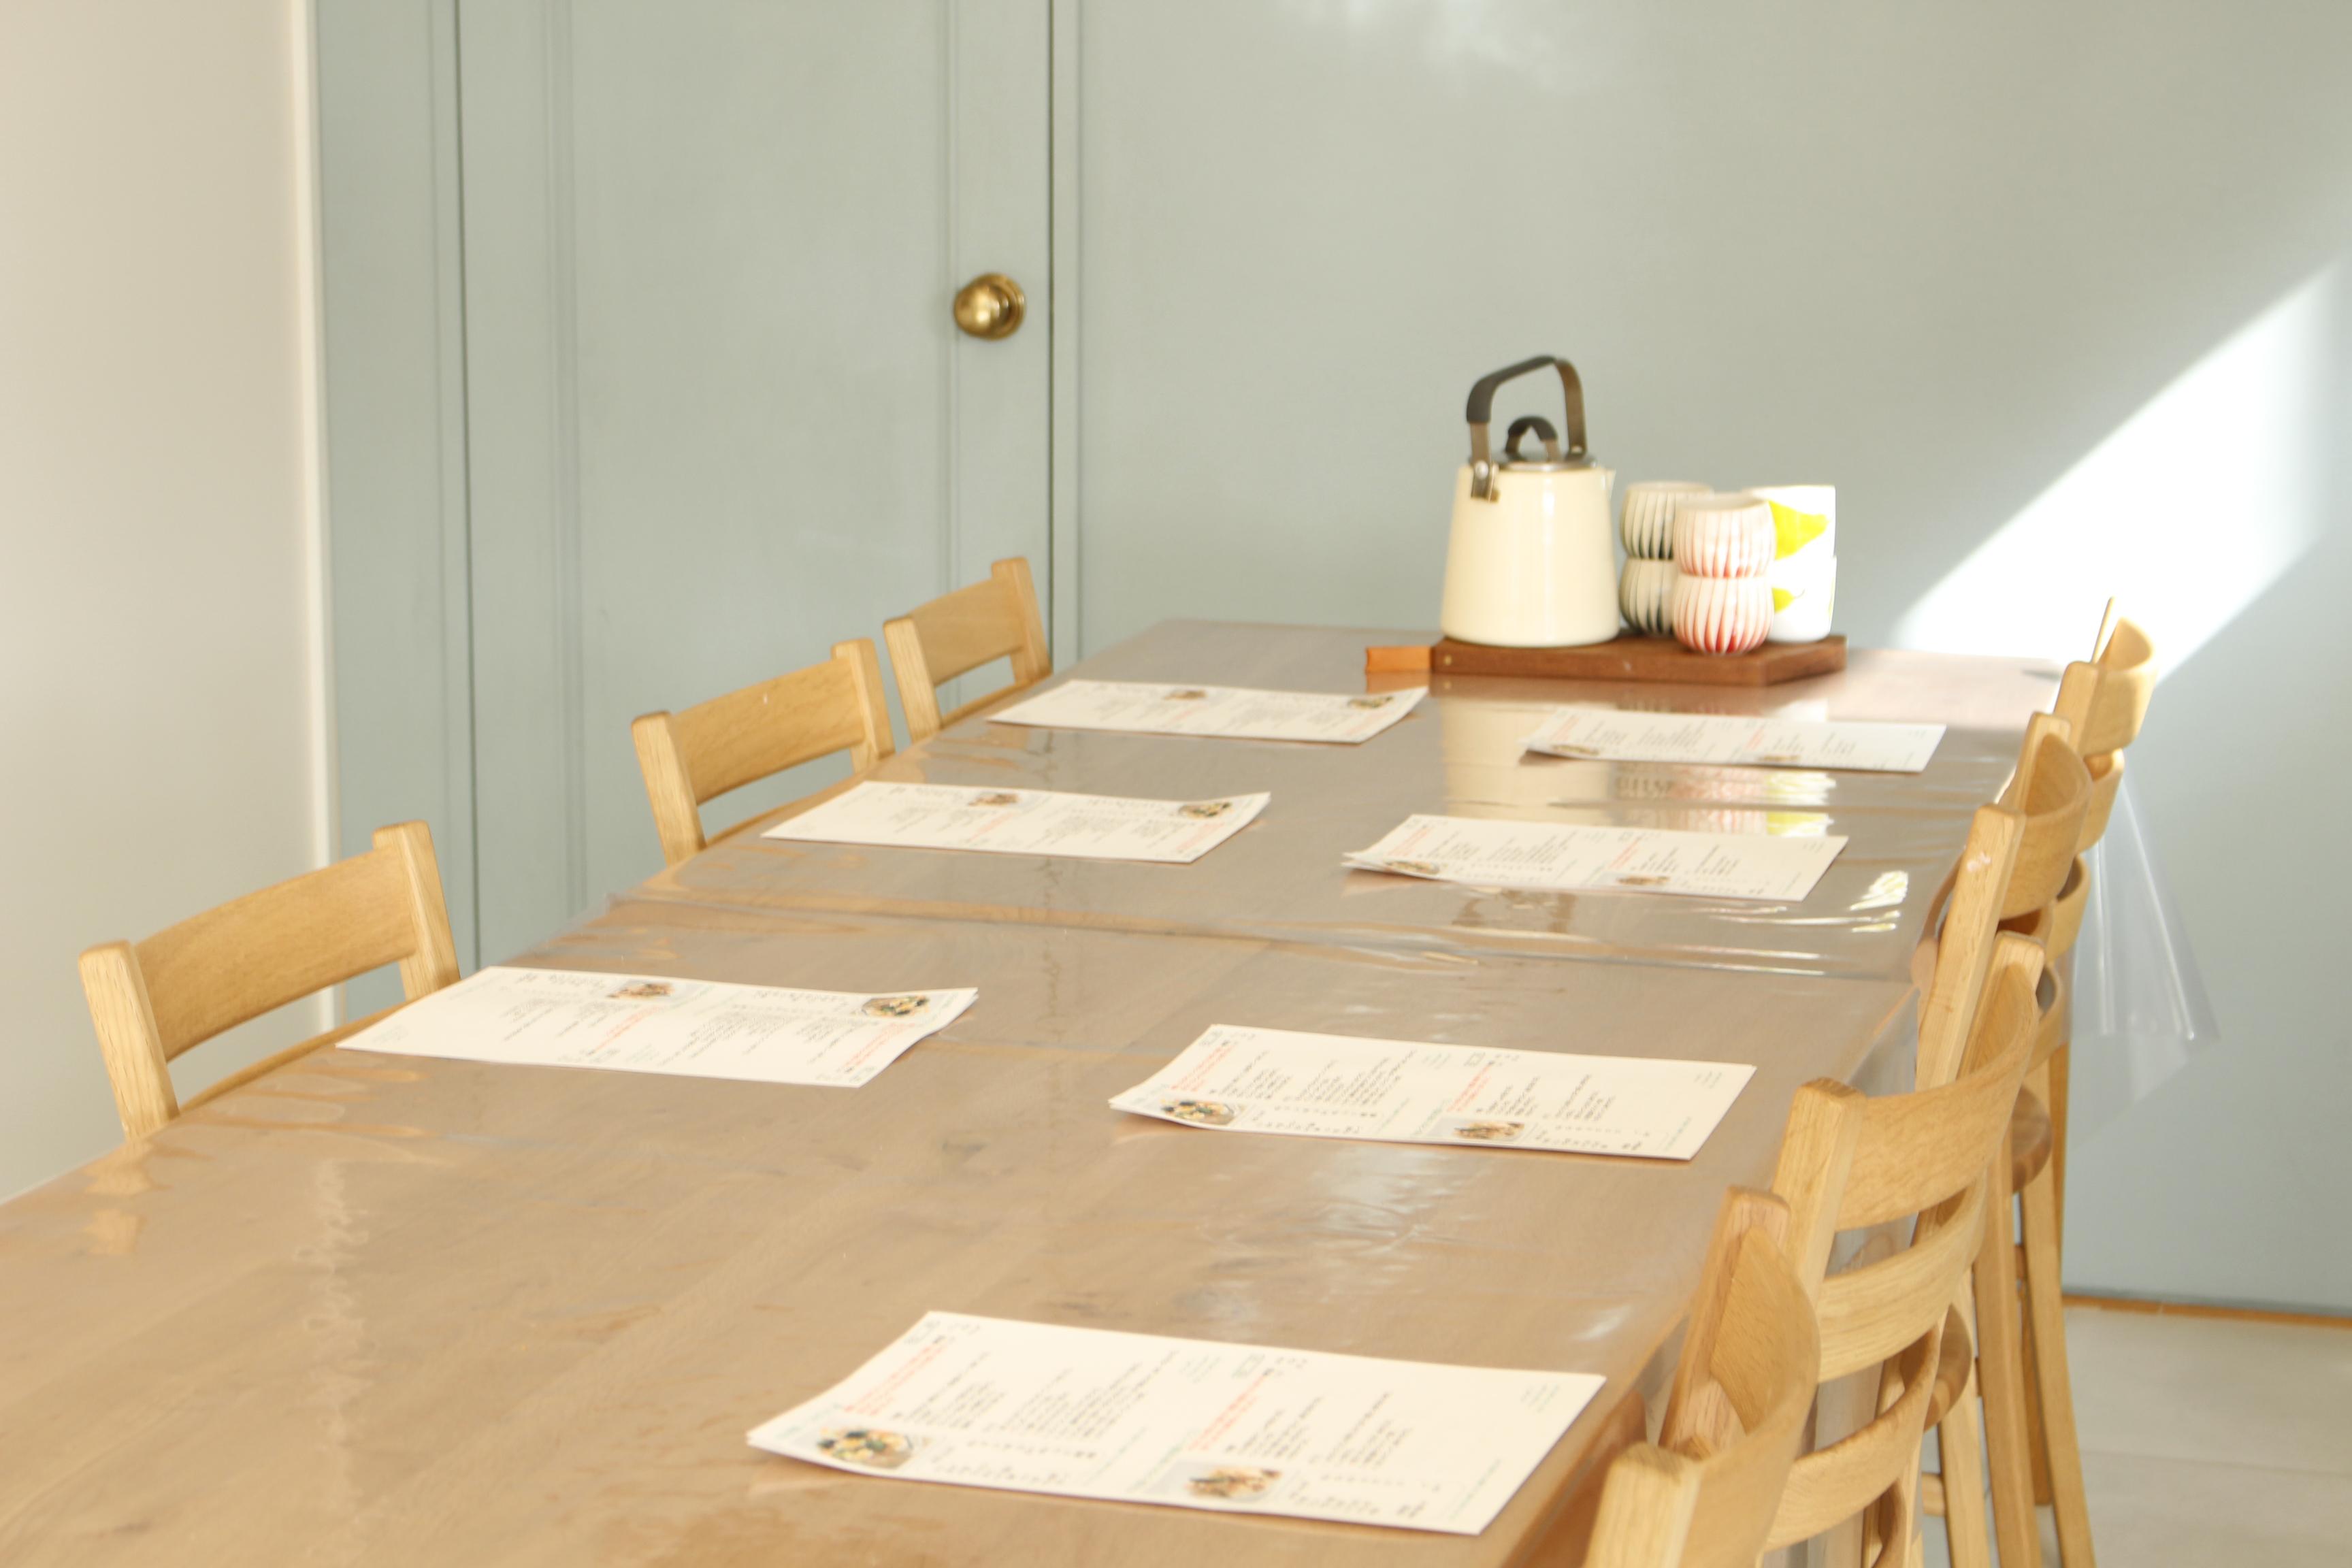 a-ta-sante糖質制限パン料理教室。2月度『糖質制限家庭料理教室』2日目。